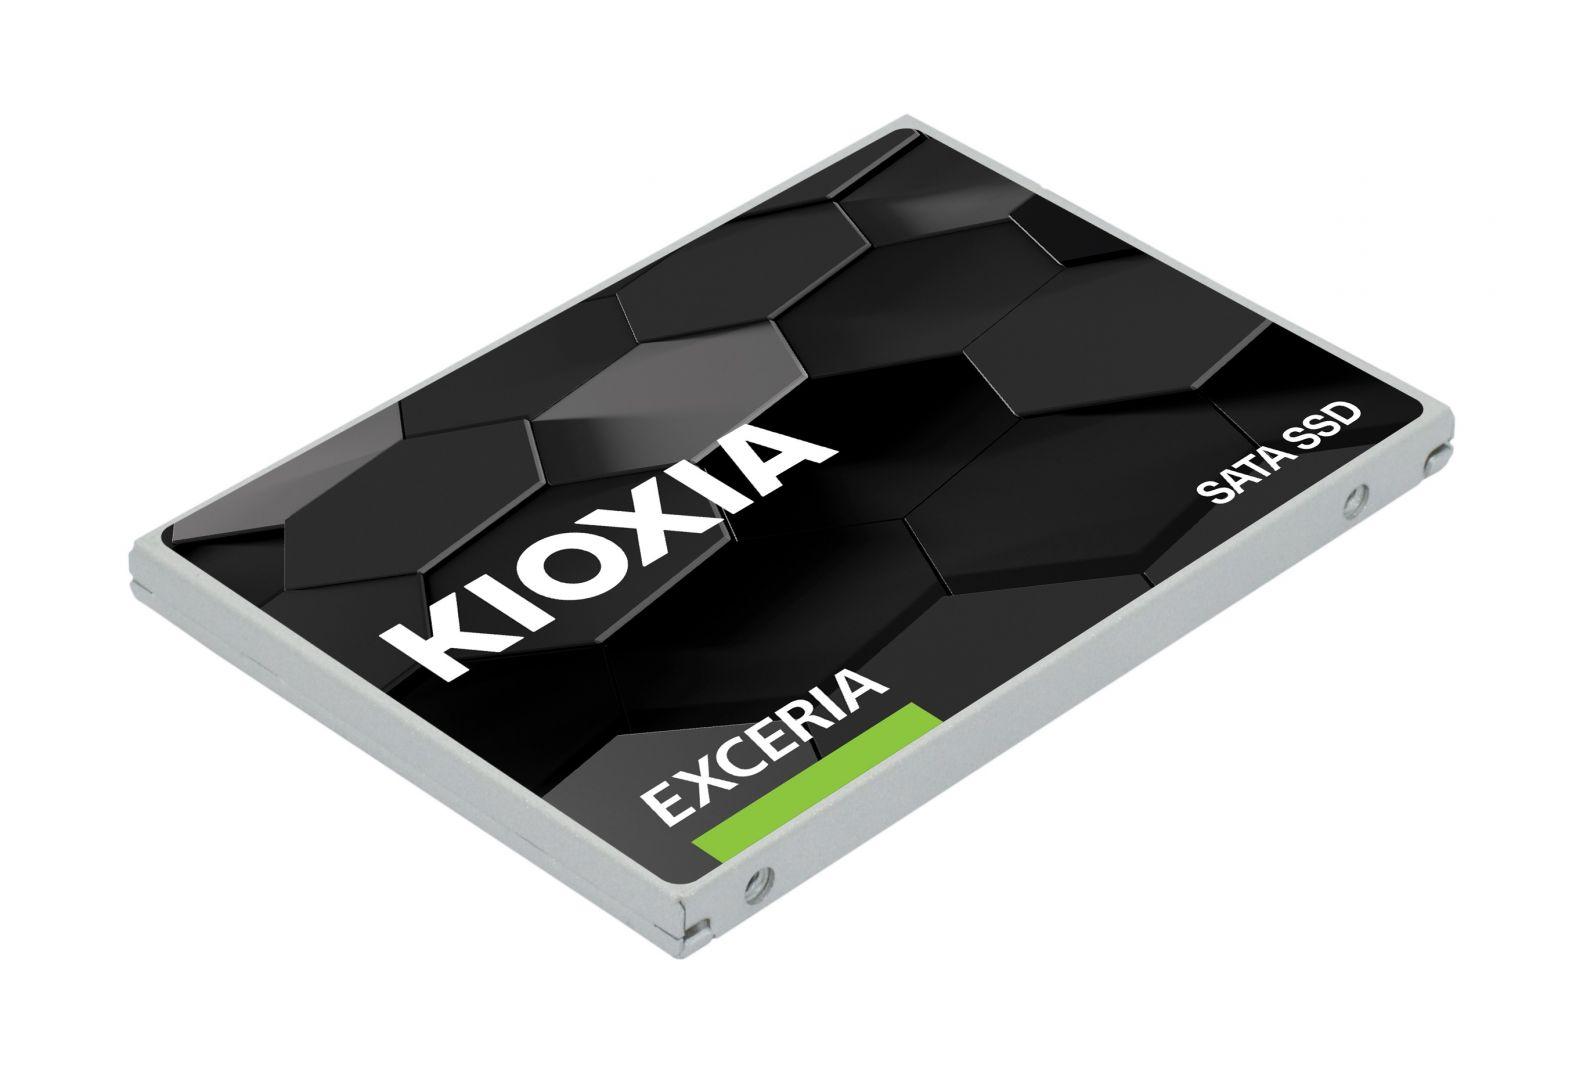 KIOXIA 960GB 2,5 SATA3 Exceria  (LTC10Z960GG8)